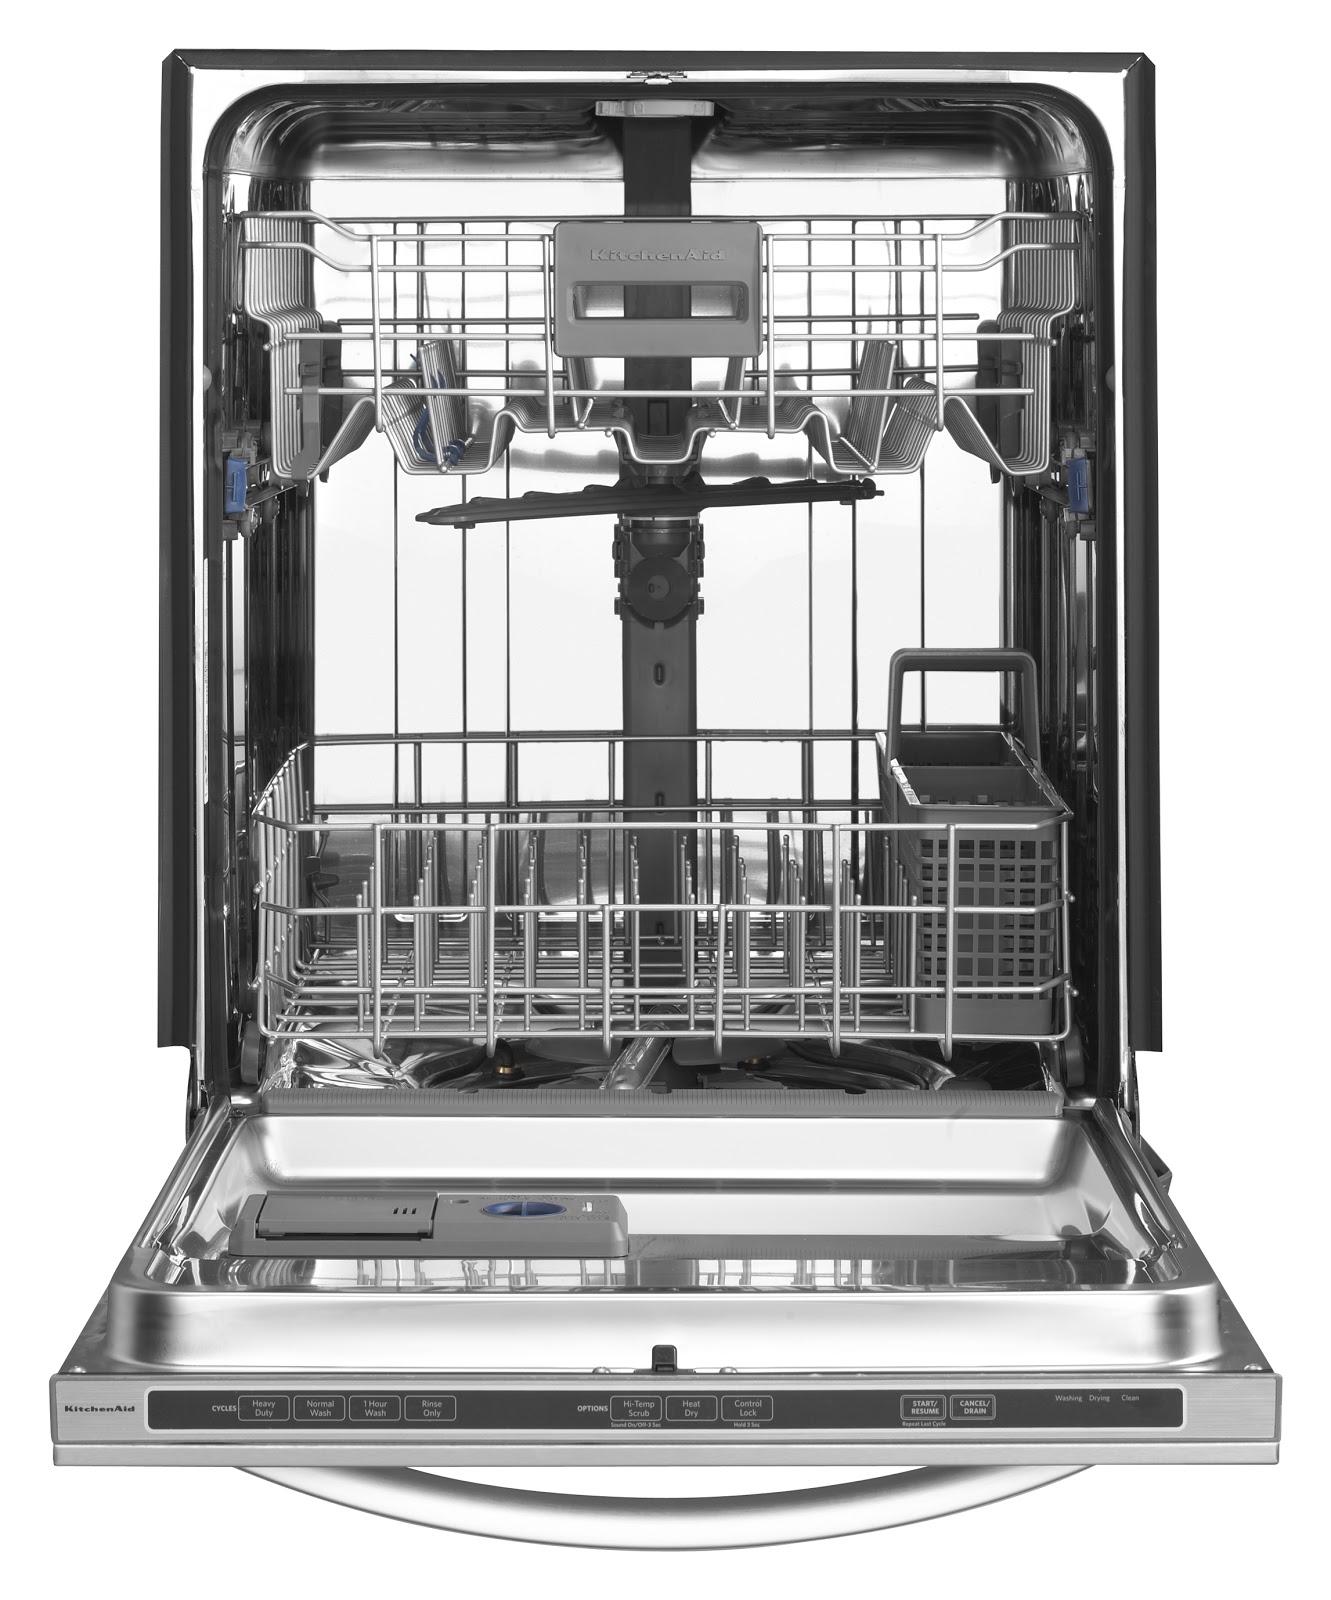 Kitchenaid Black Appliances: Judd & Black Appliance: KitchenAid Dishwashers